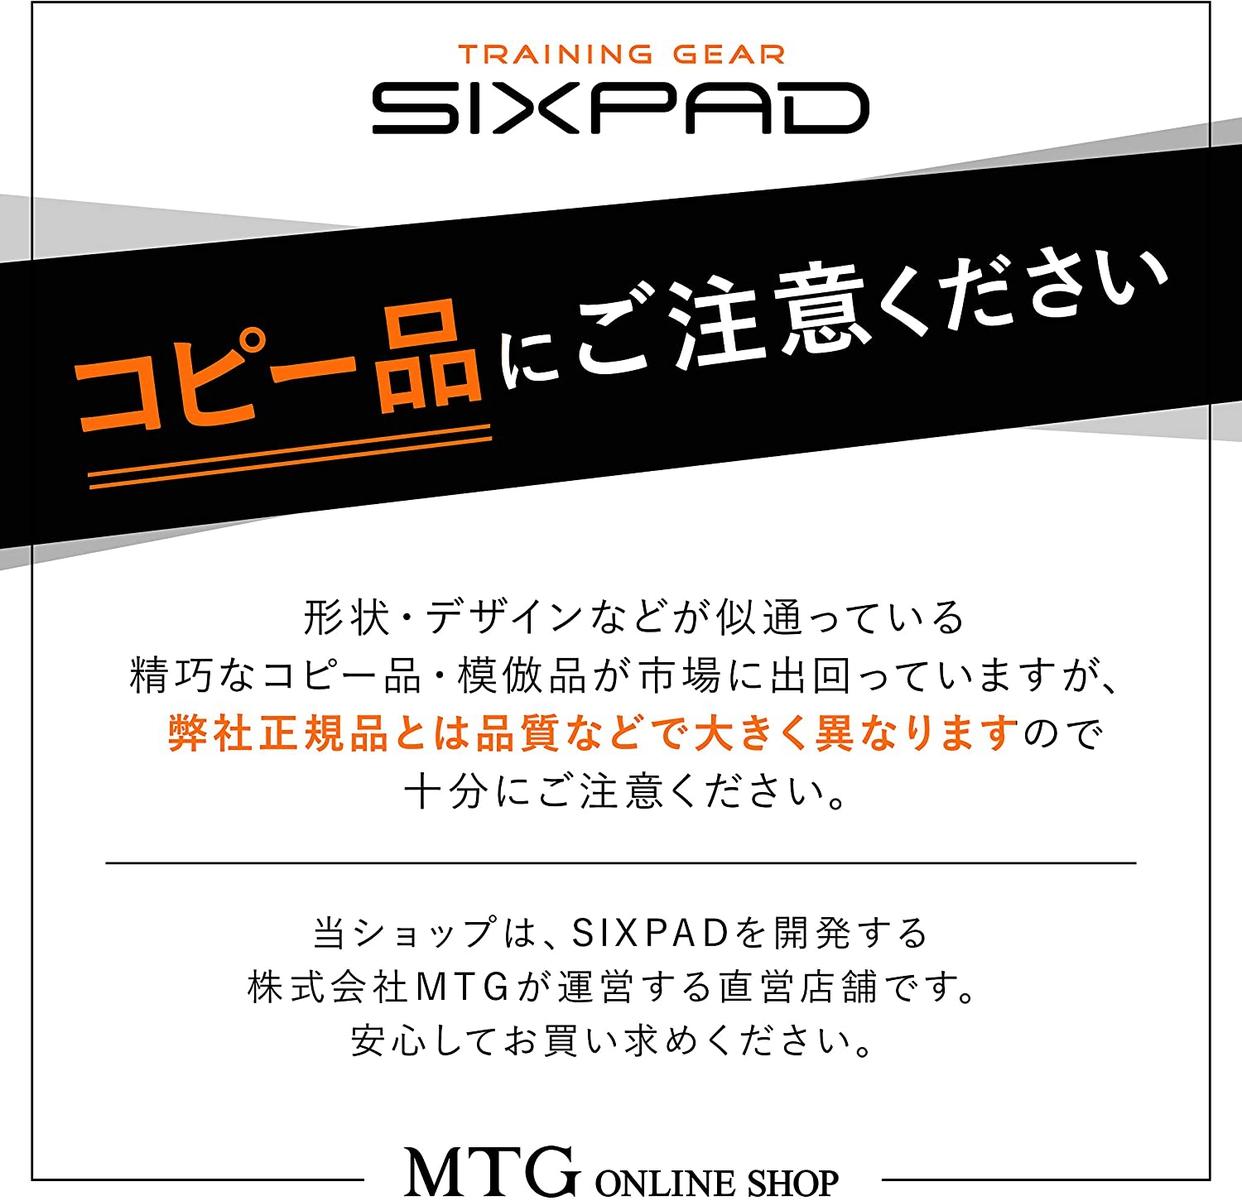 SIXPAD(シックスパッド) アブズベルトの商品画像2